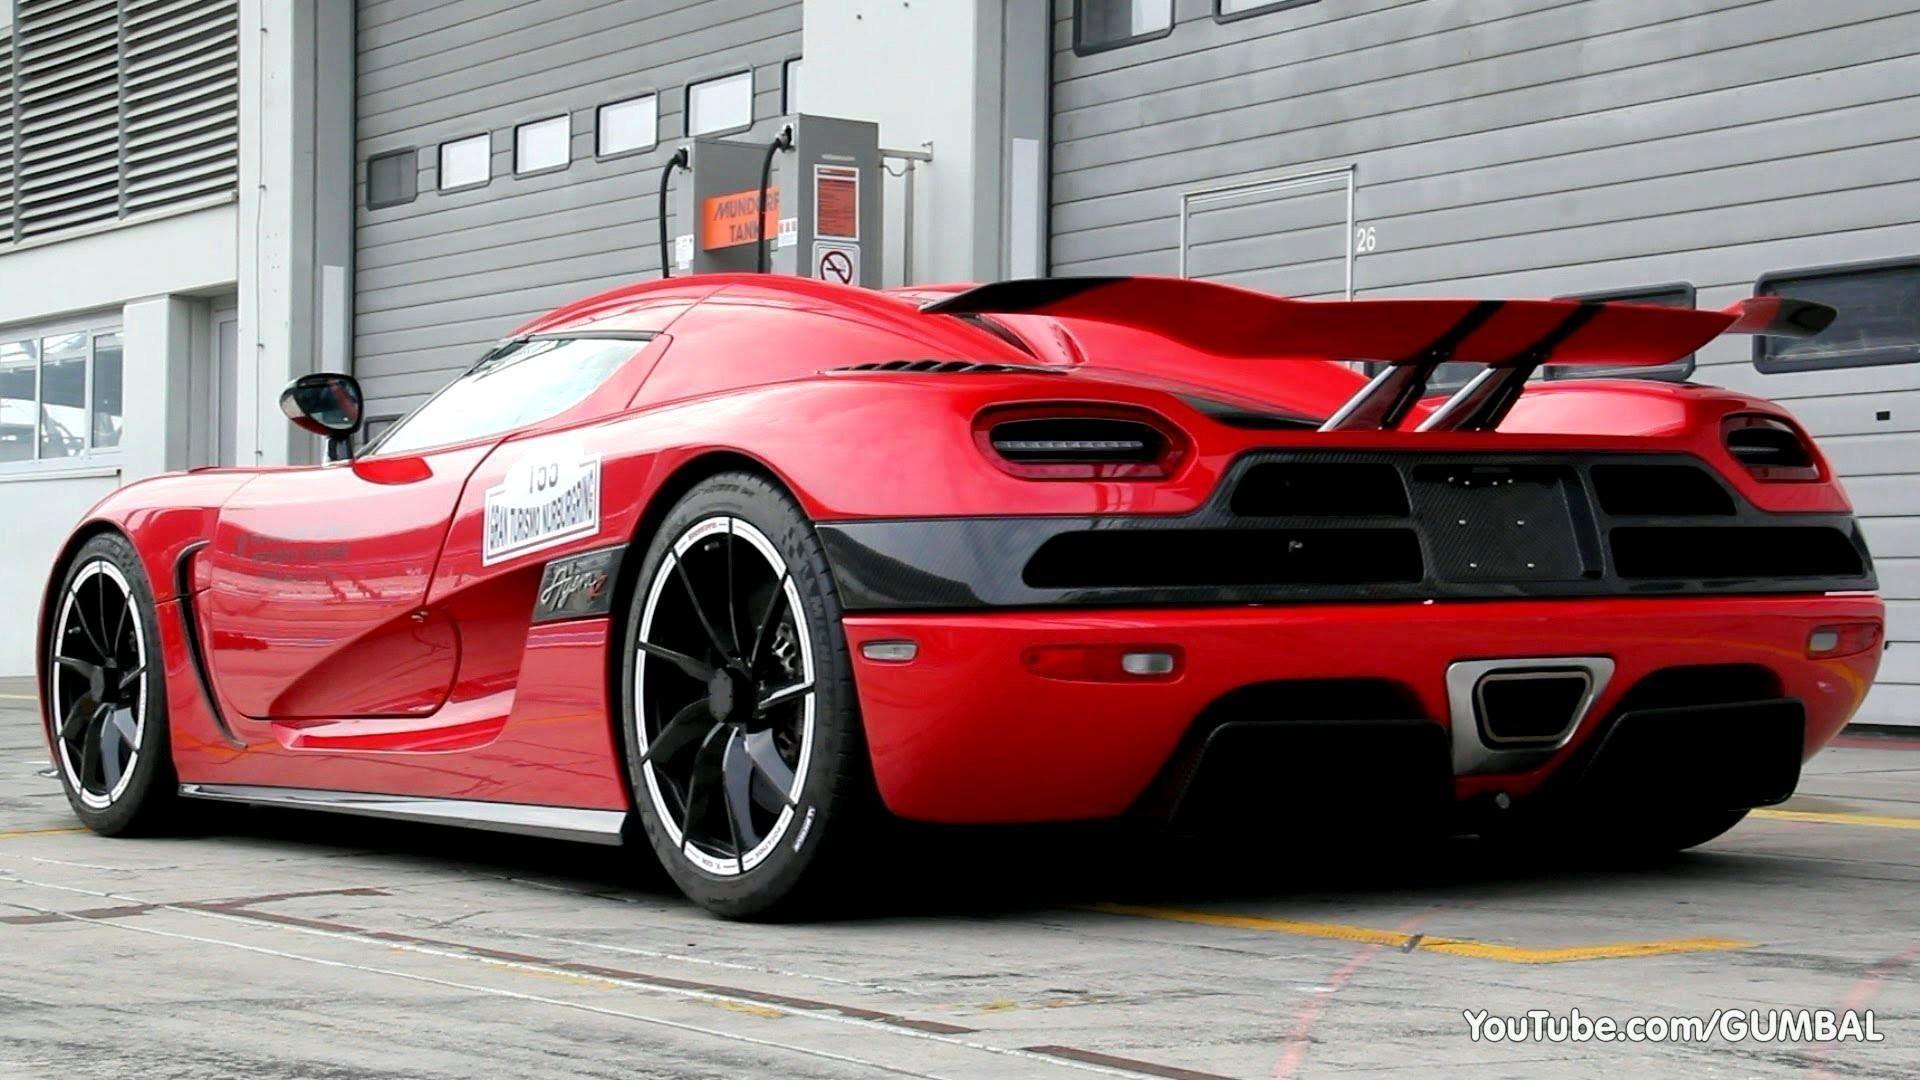 Koenigsegg Agera R Wallpaper Hd 69 Images